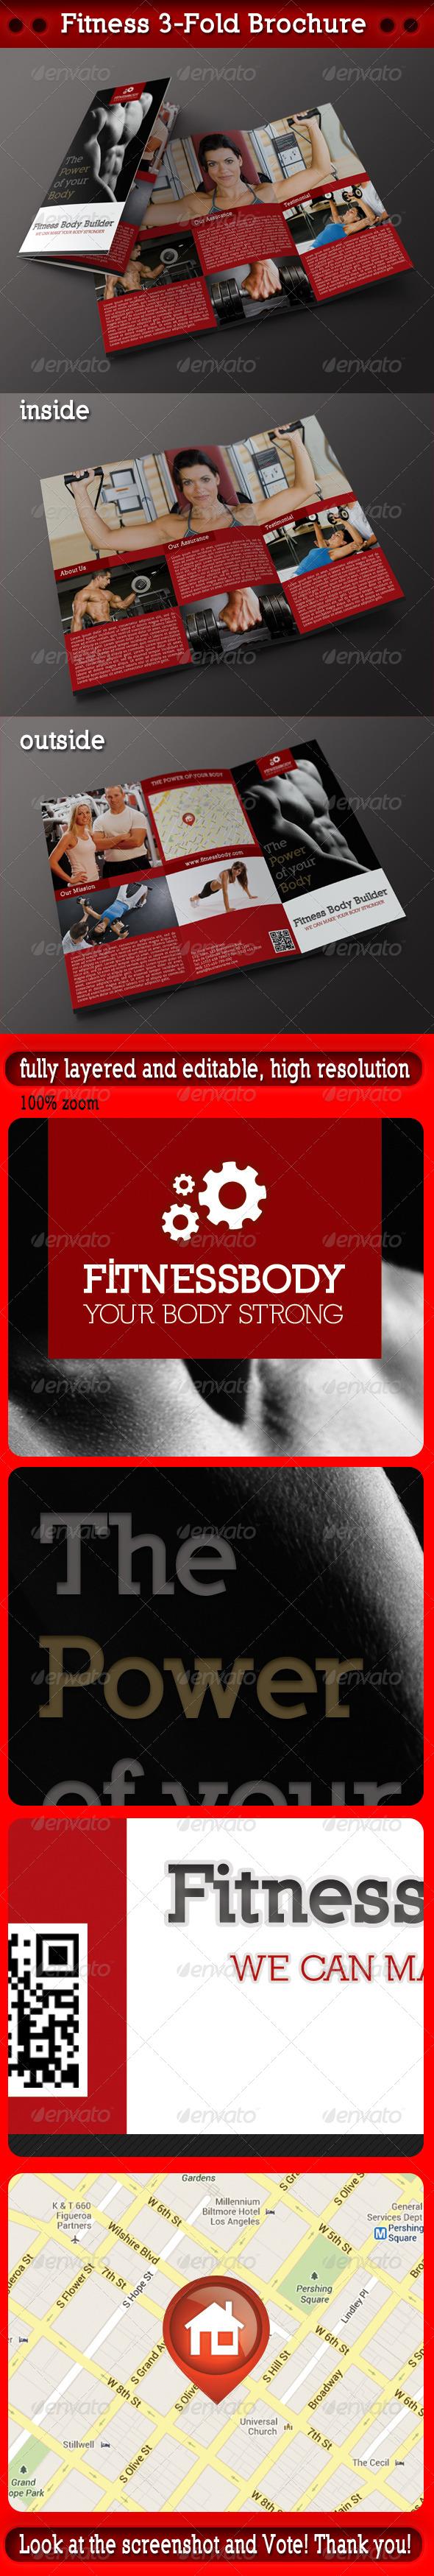 Fitness 3-Fold Brochure